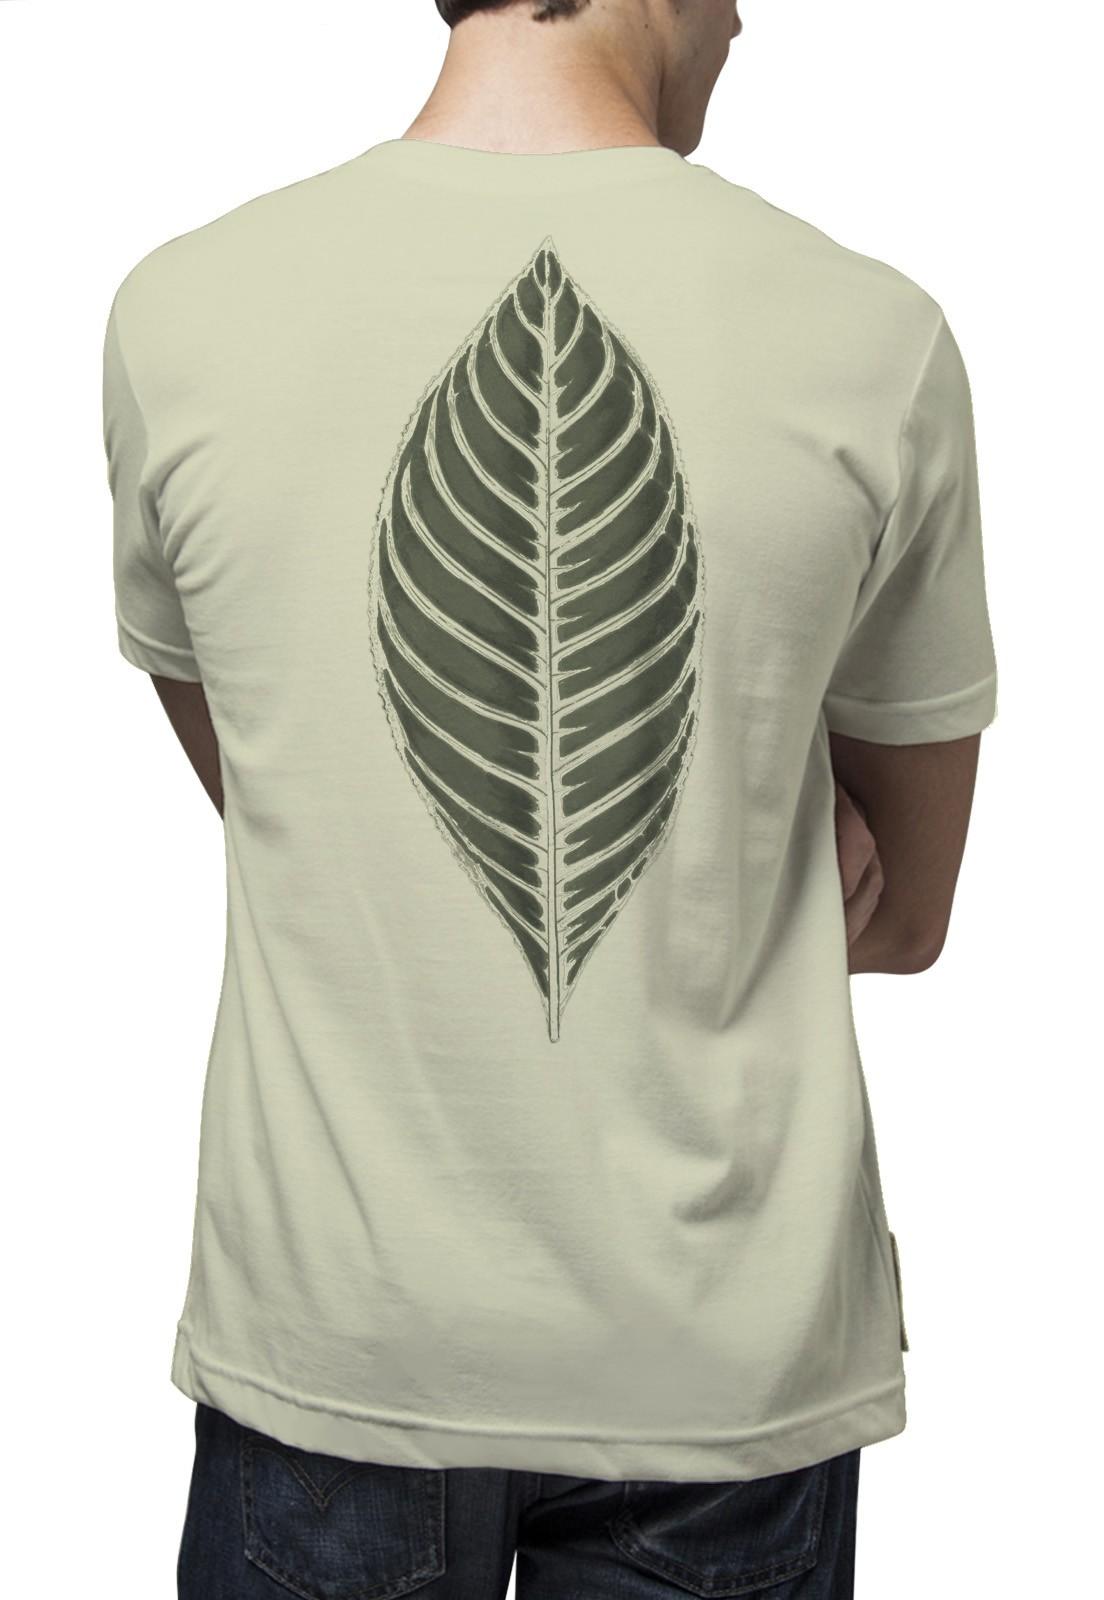 Camiseta Amazônia Folha - Verde Claro